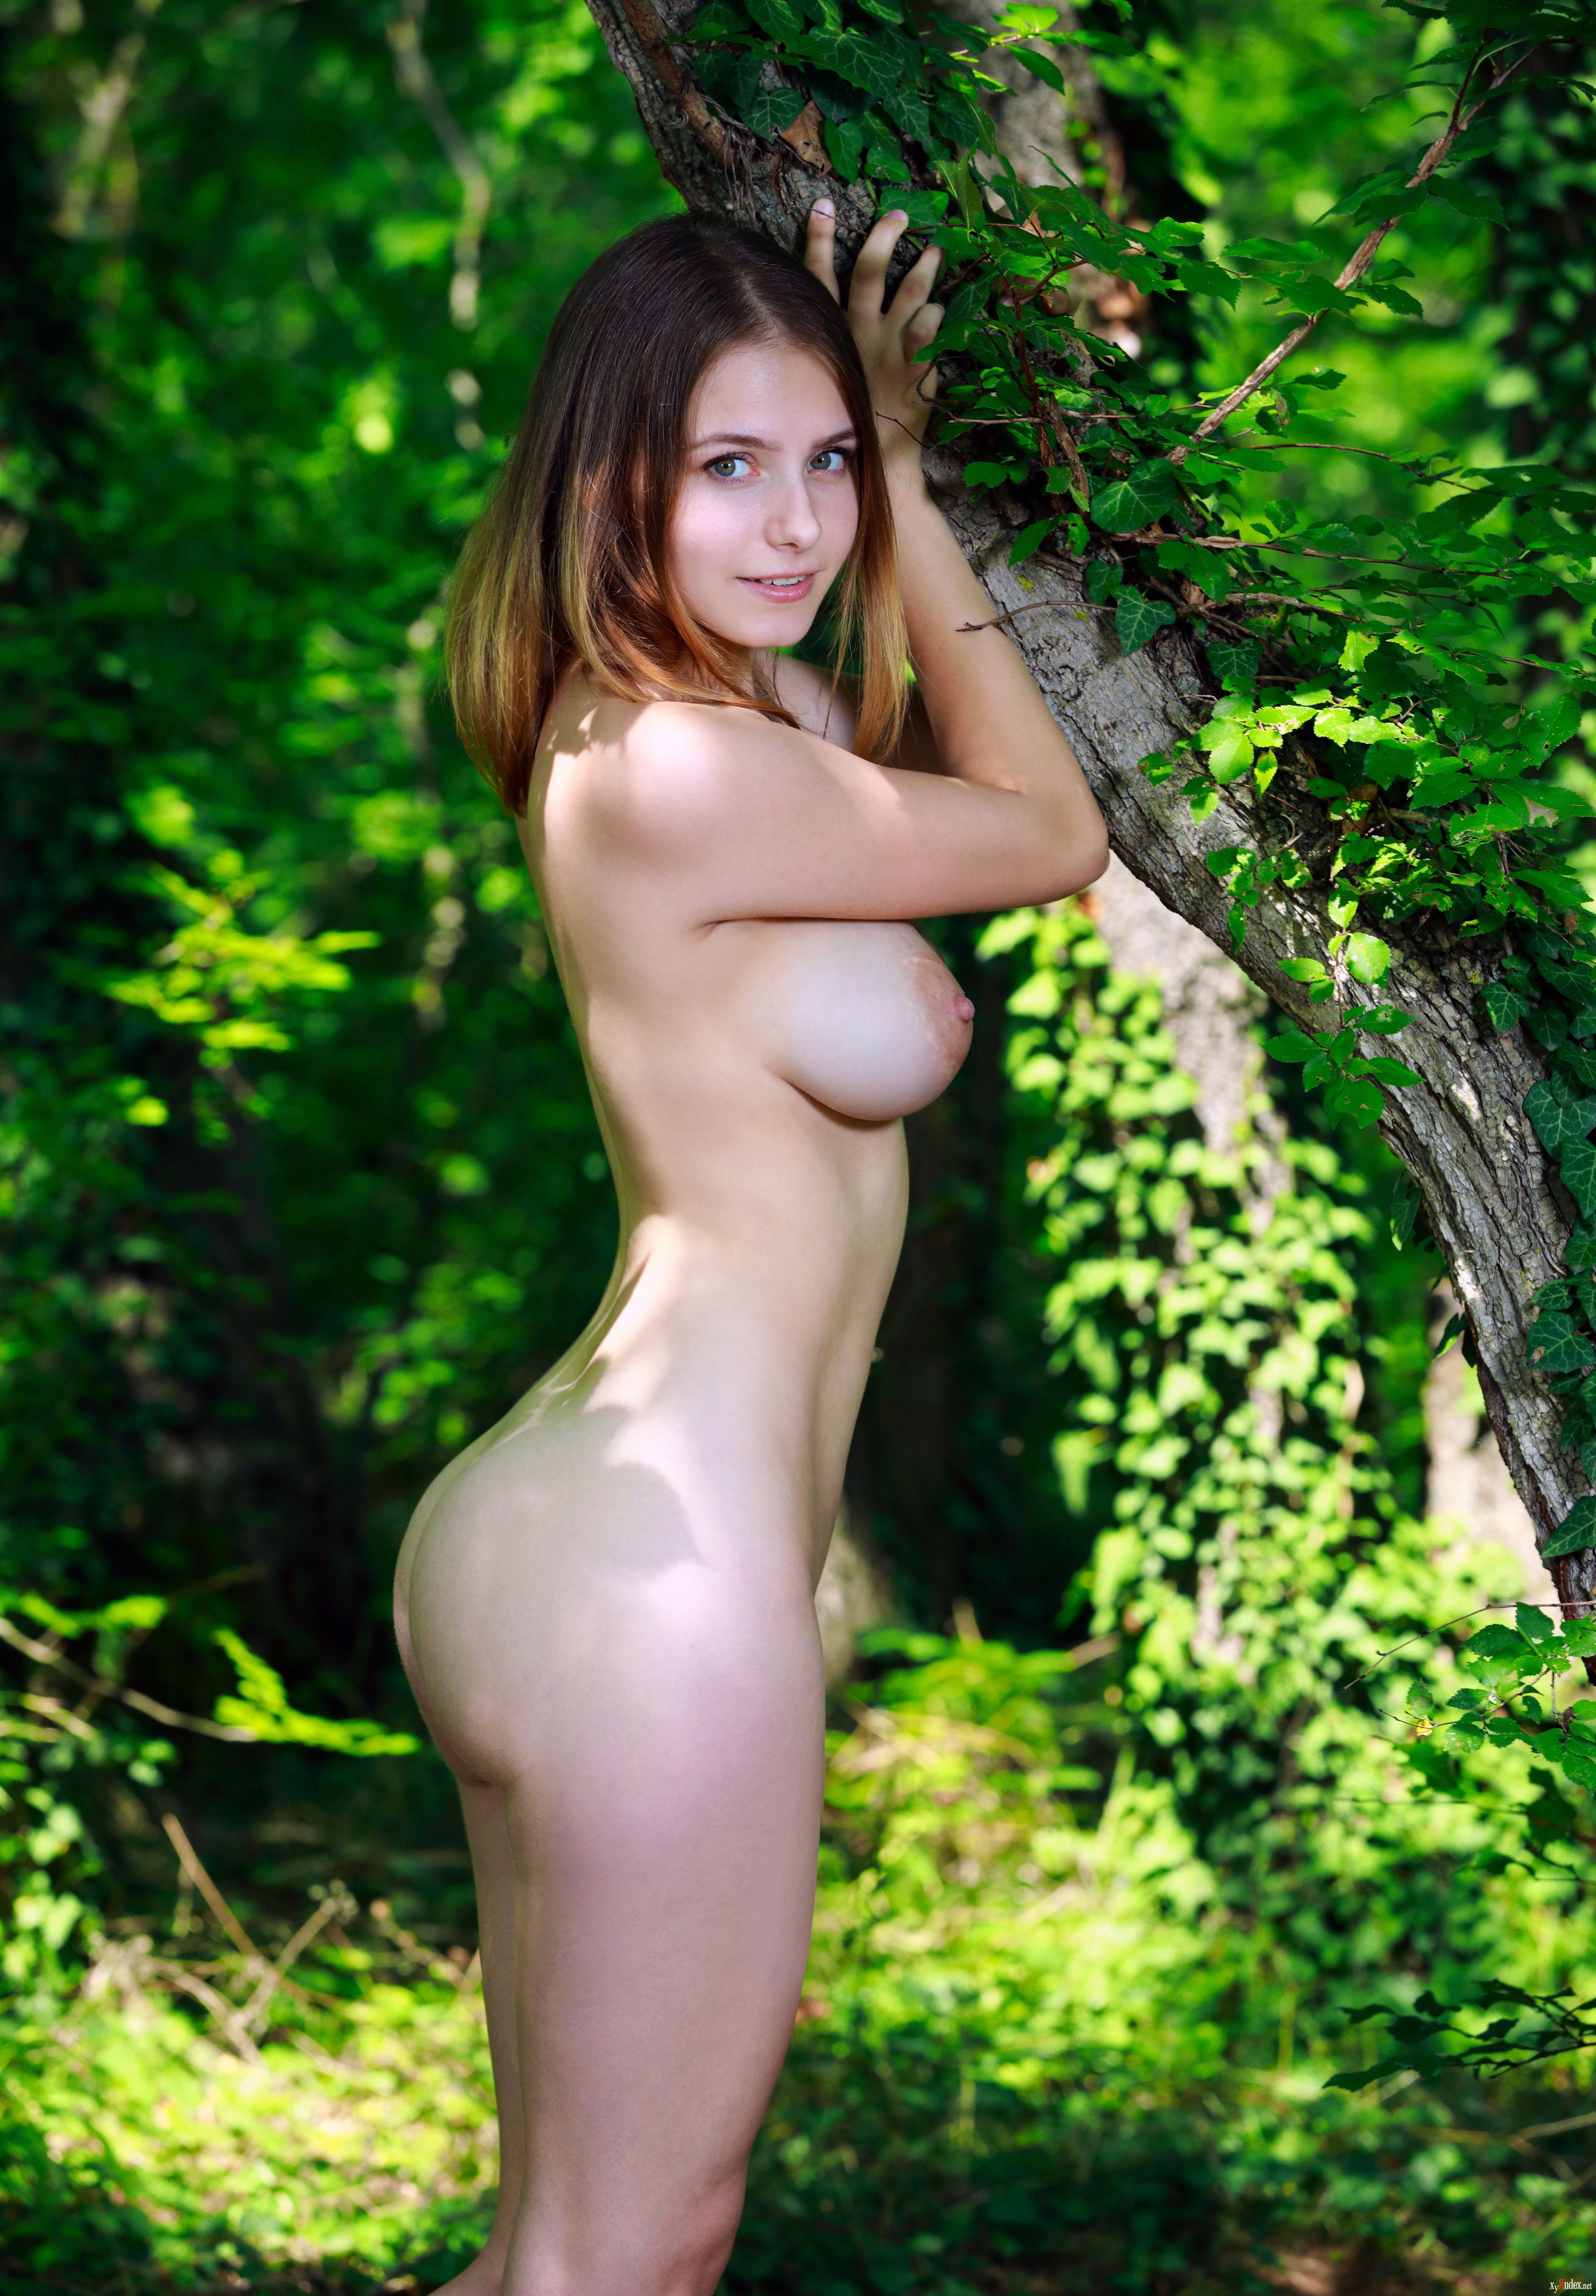 girls-of-south-dakota-nude-swingerslife-style-mfm-sex-stories